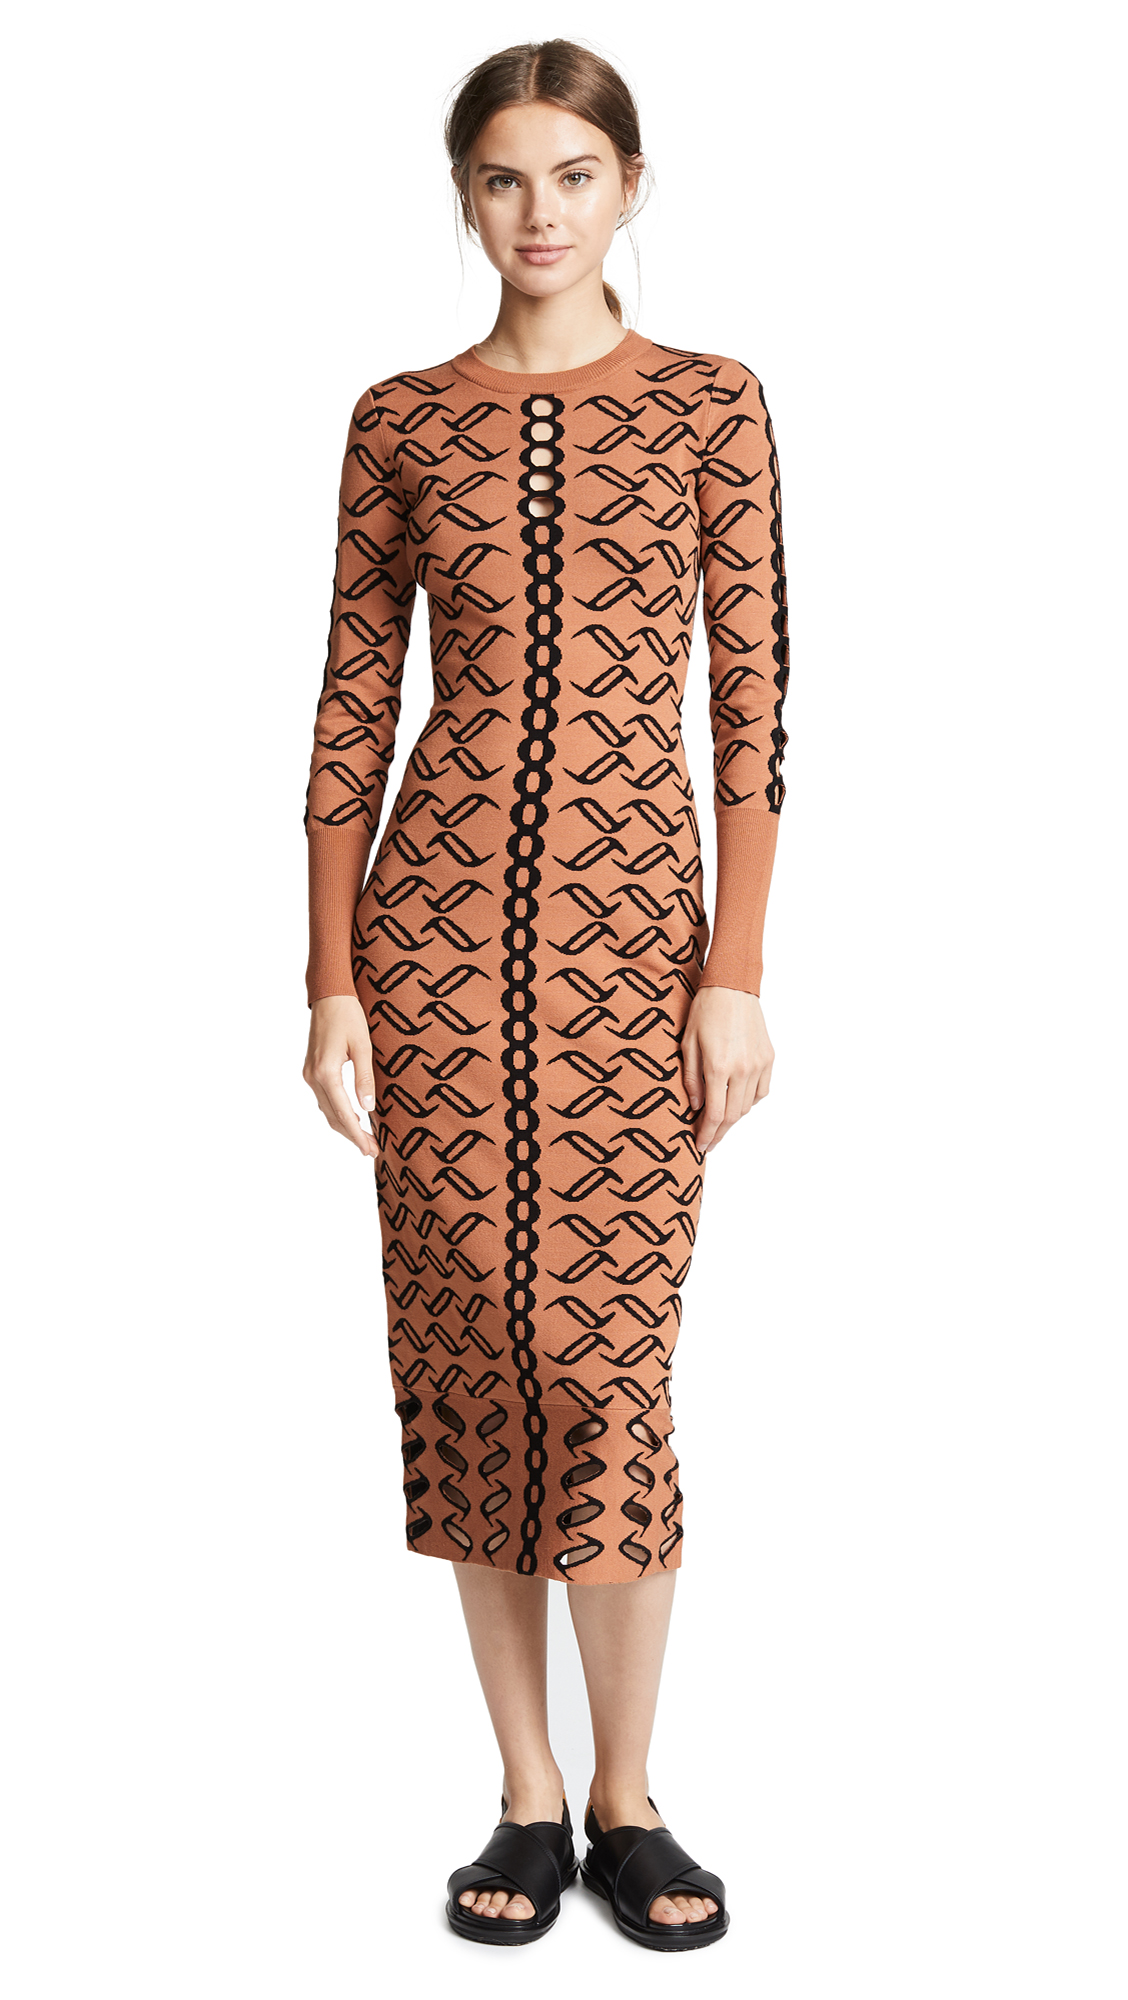 Temperley London Desert Dress In Clay Mix